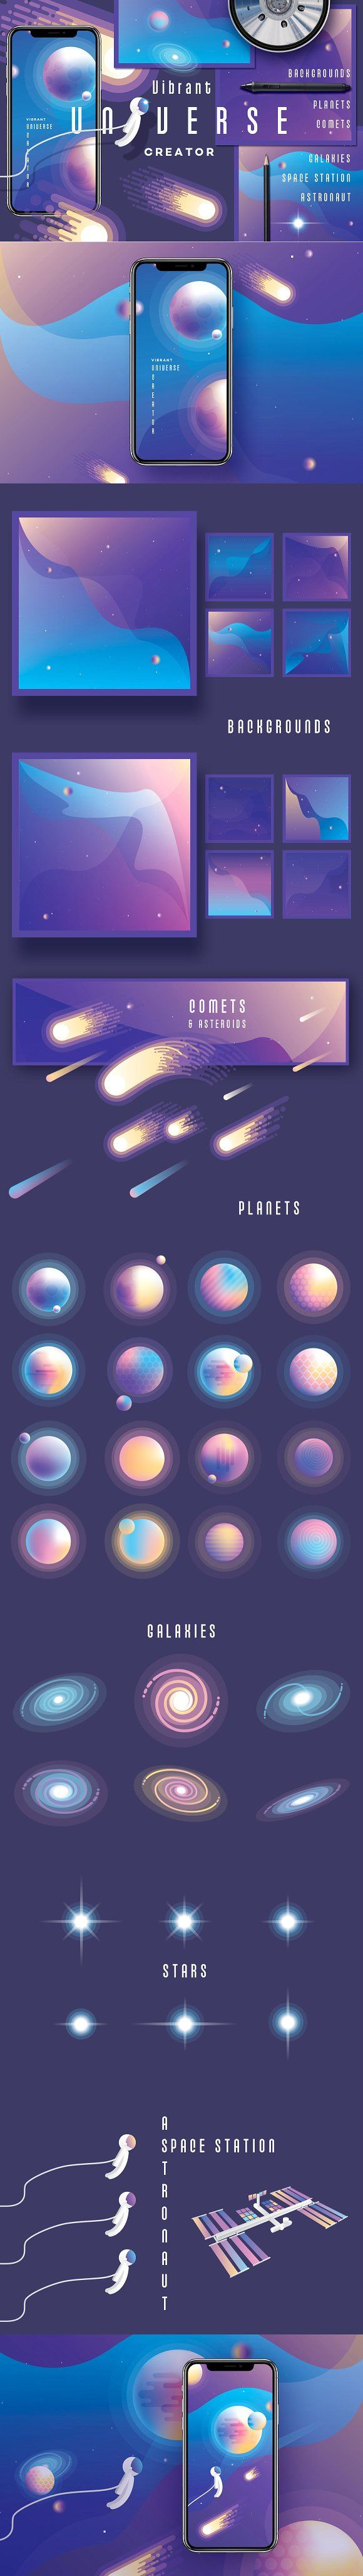 Vibrant Universe Creator by Polar Vectors on @creativemarket